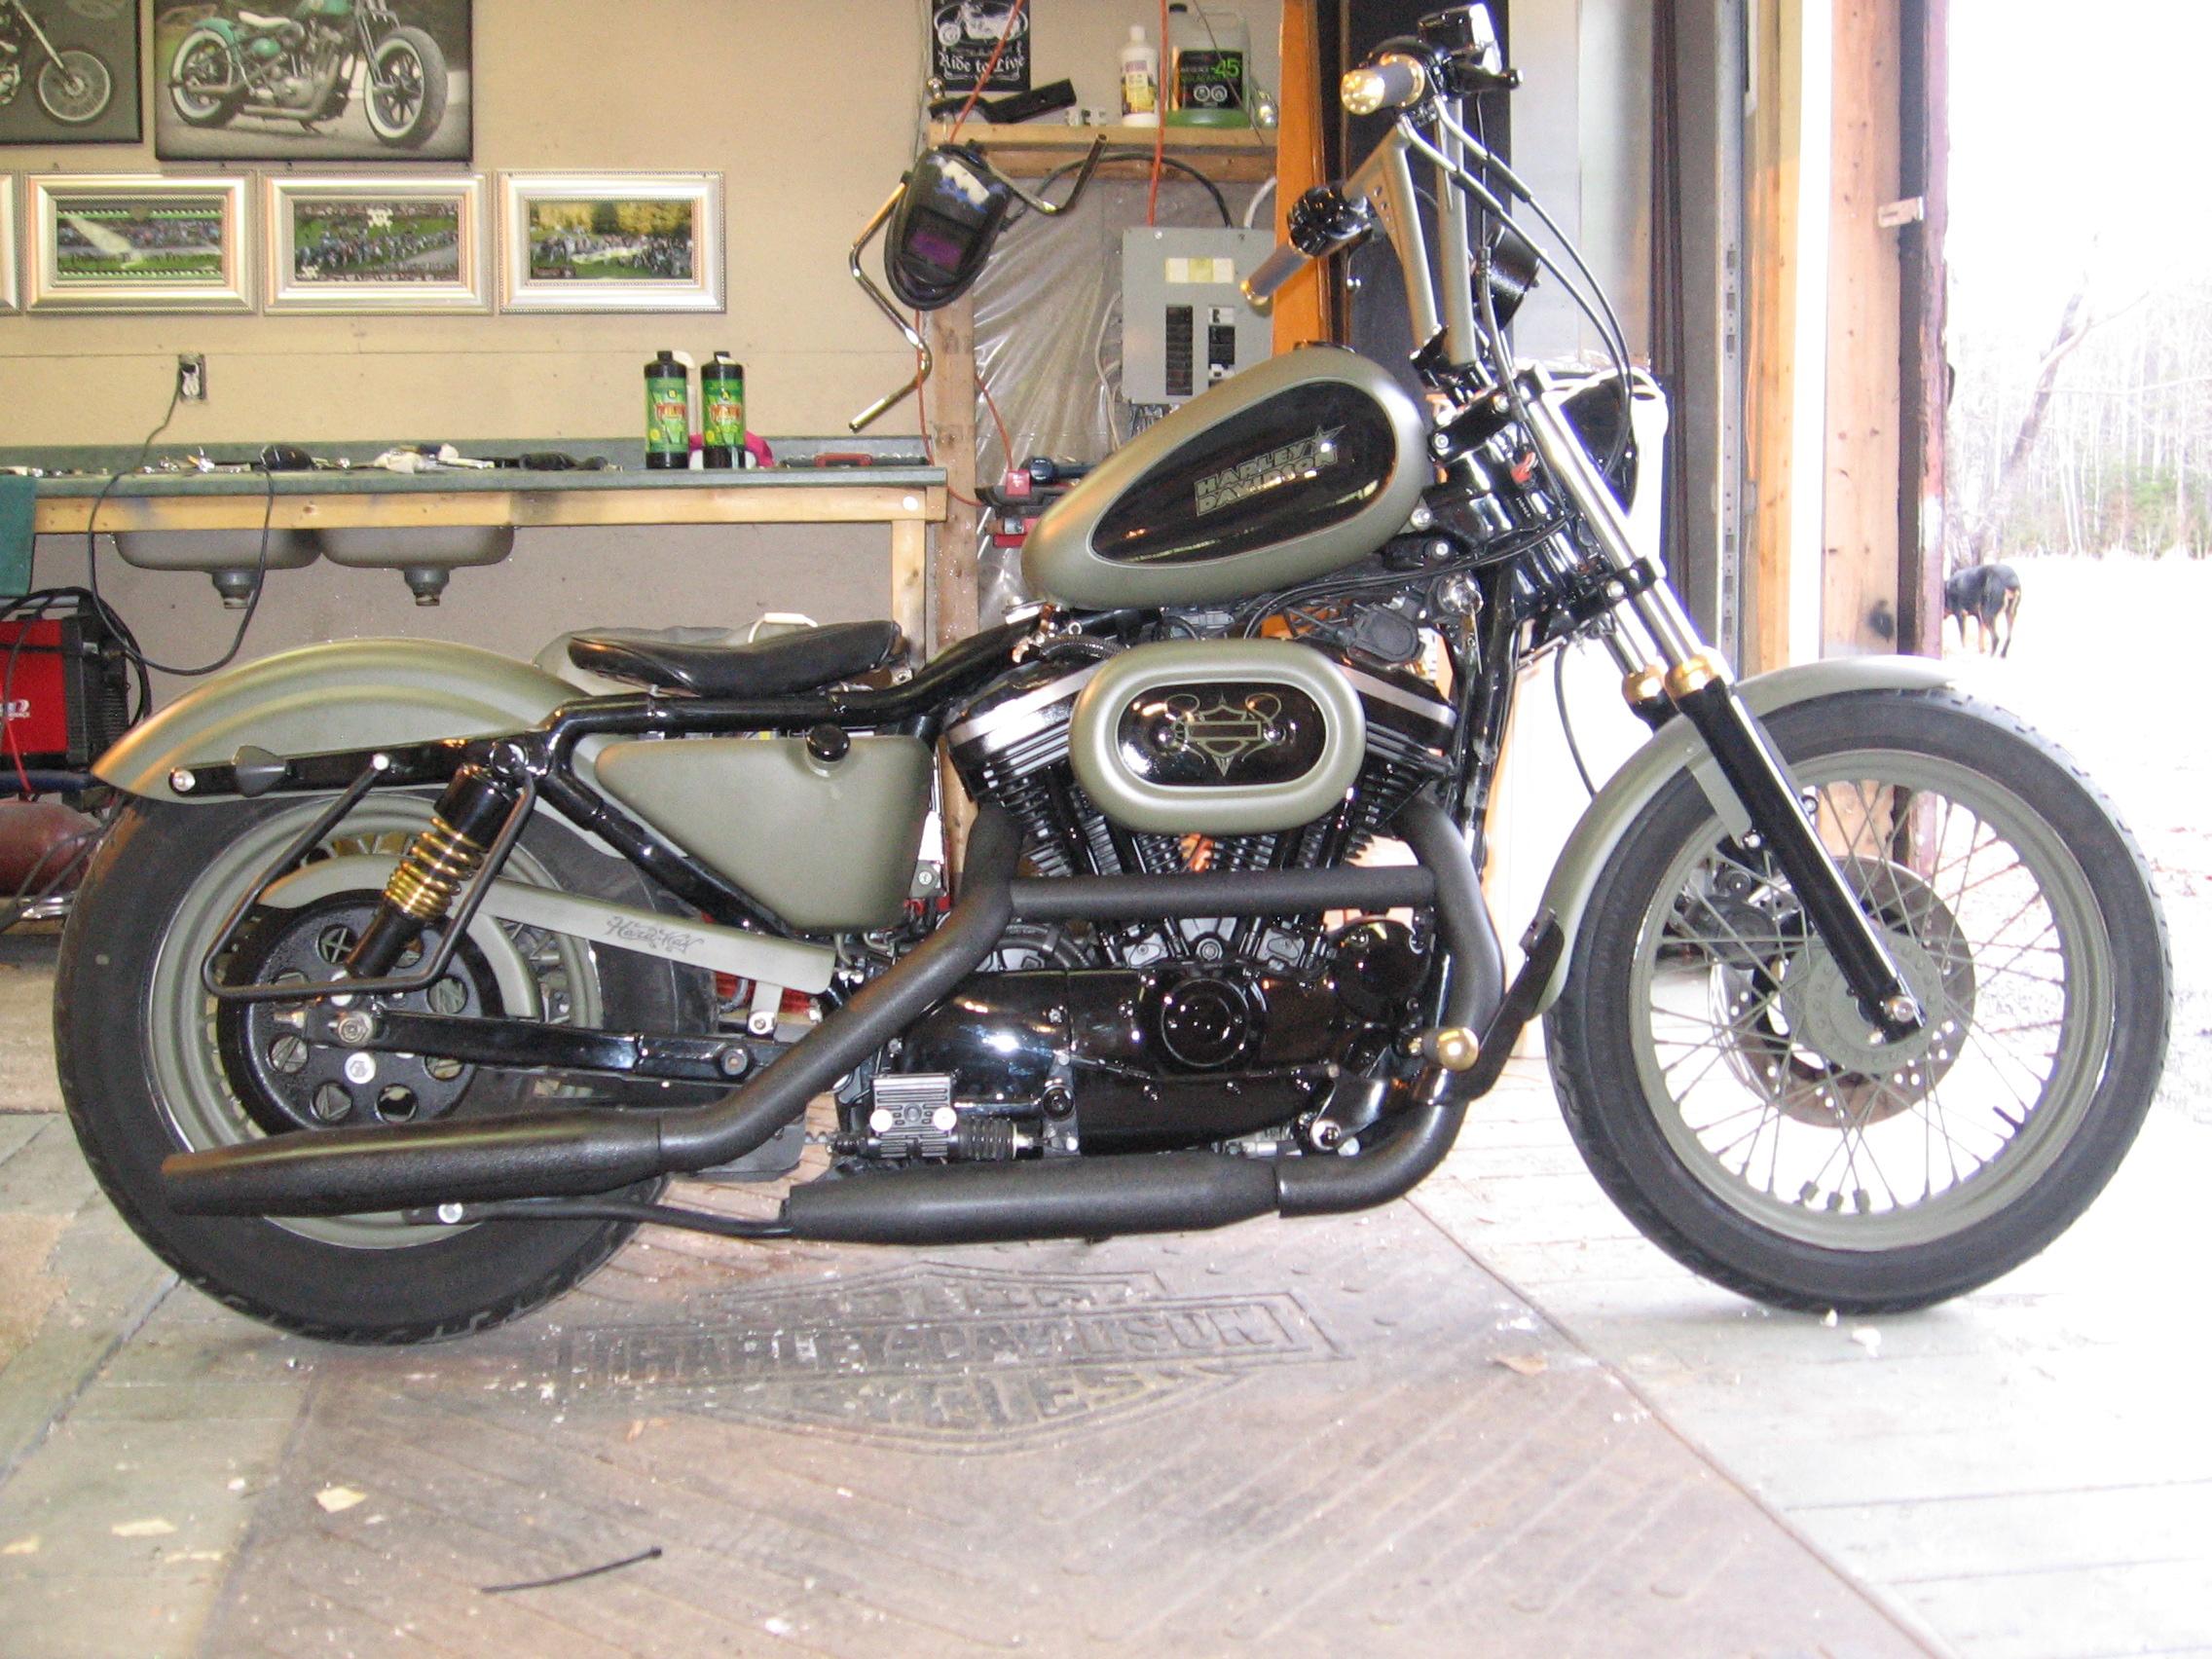 Wanda's Bike052